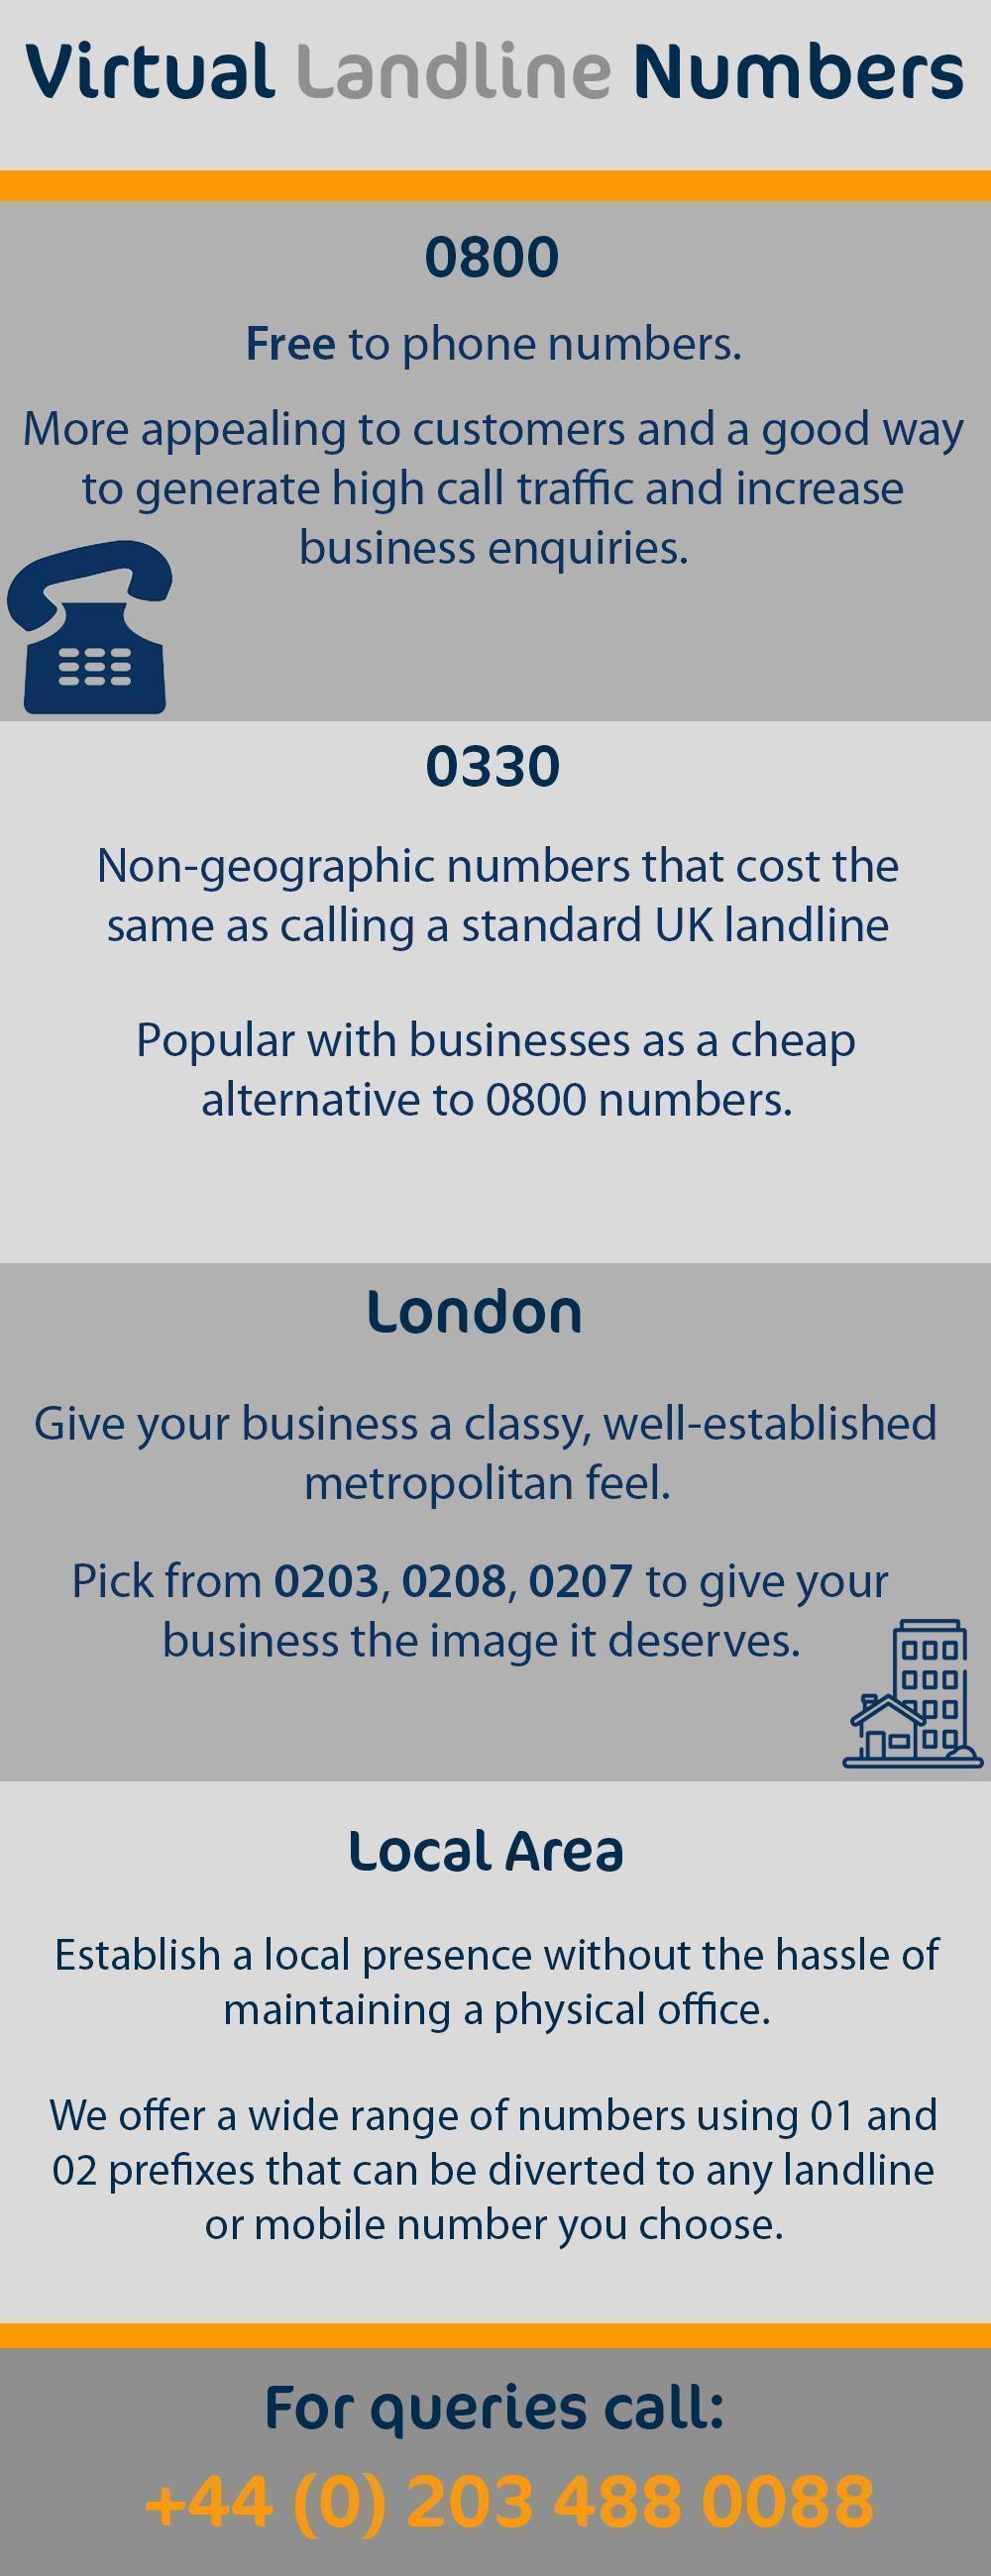 Virtual Number Comparison